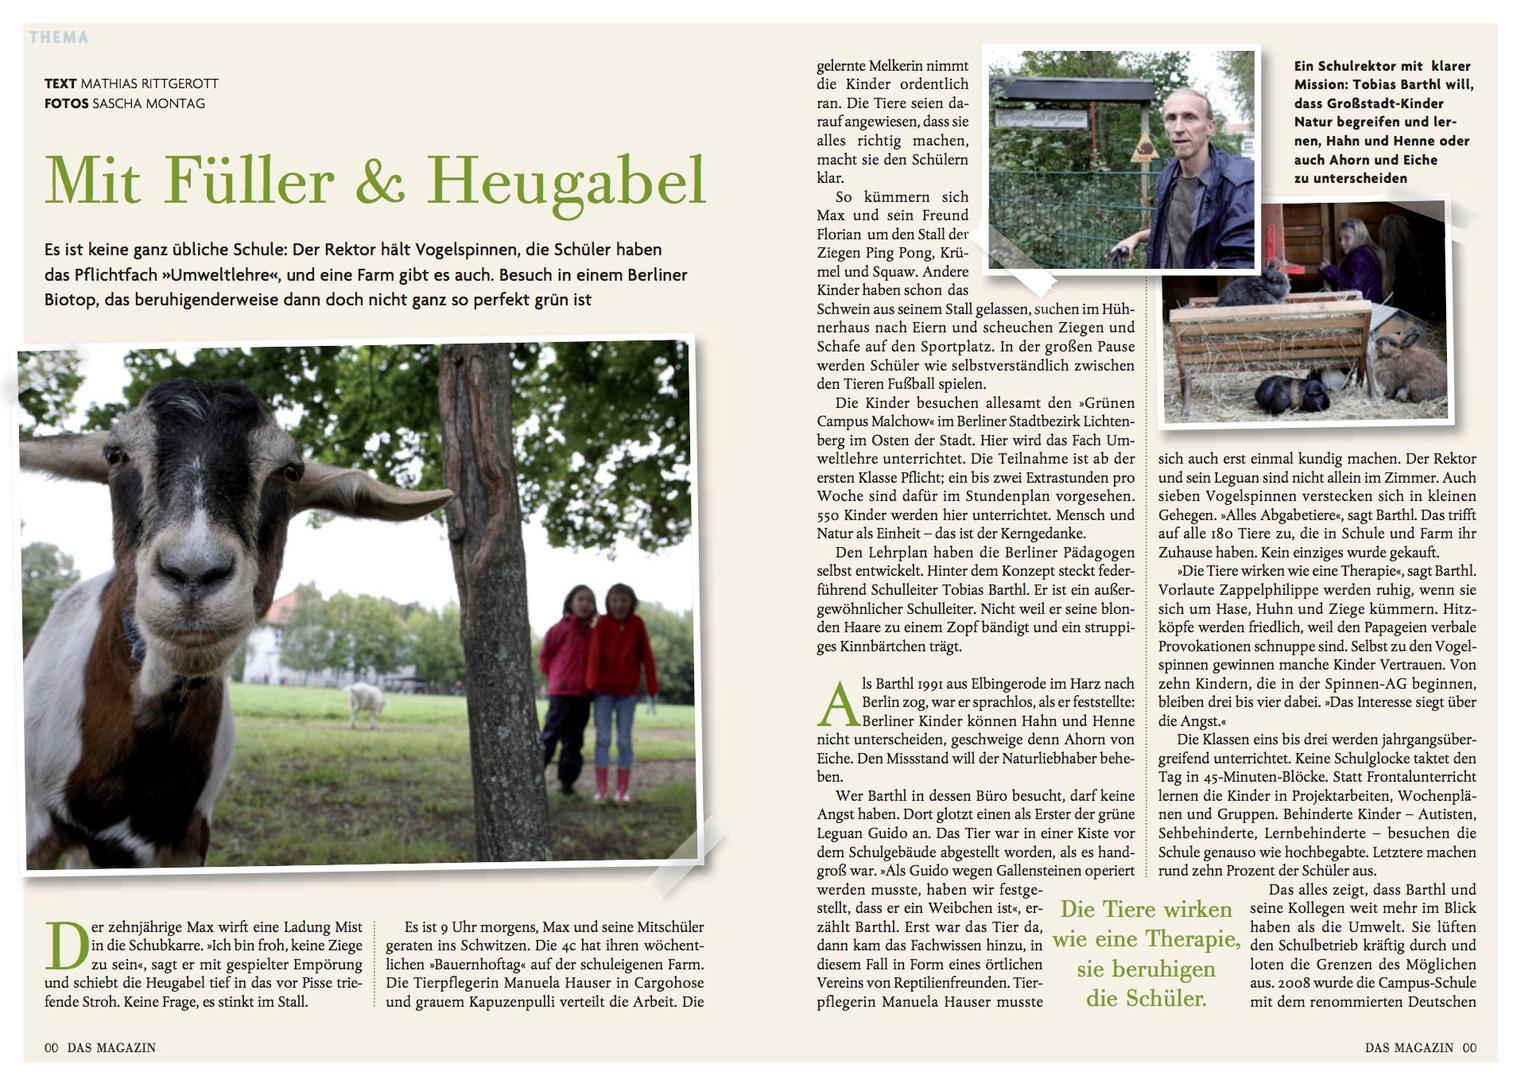 Das Magazin 03.2012